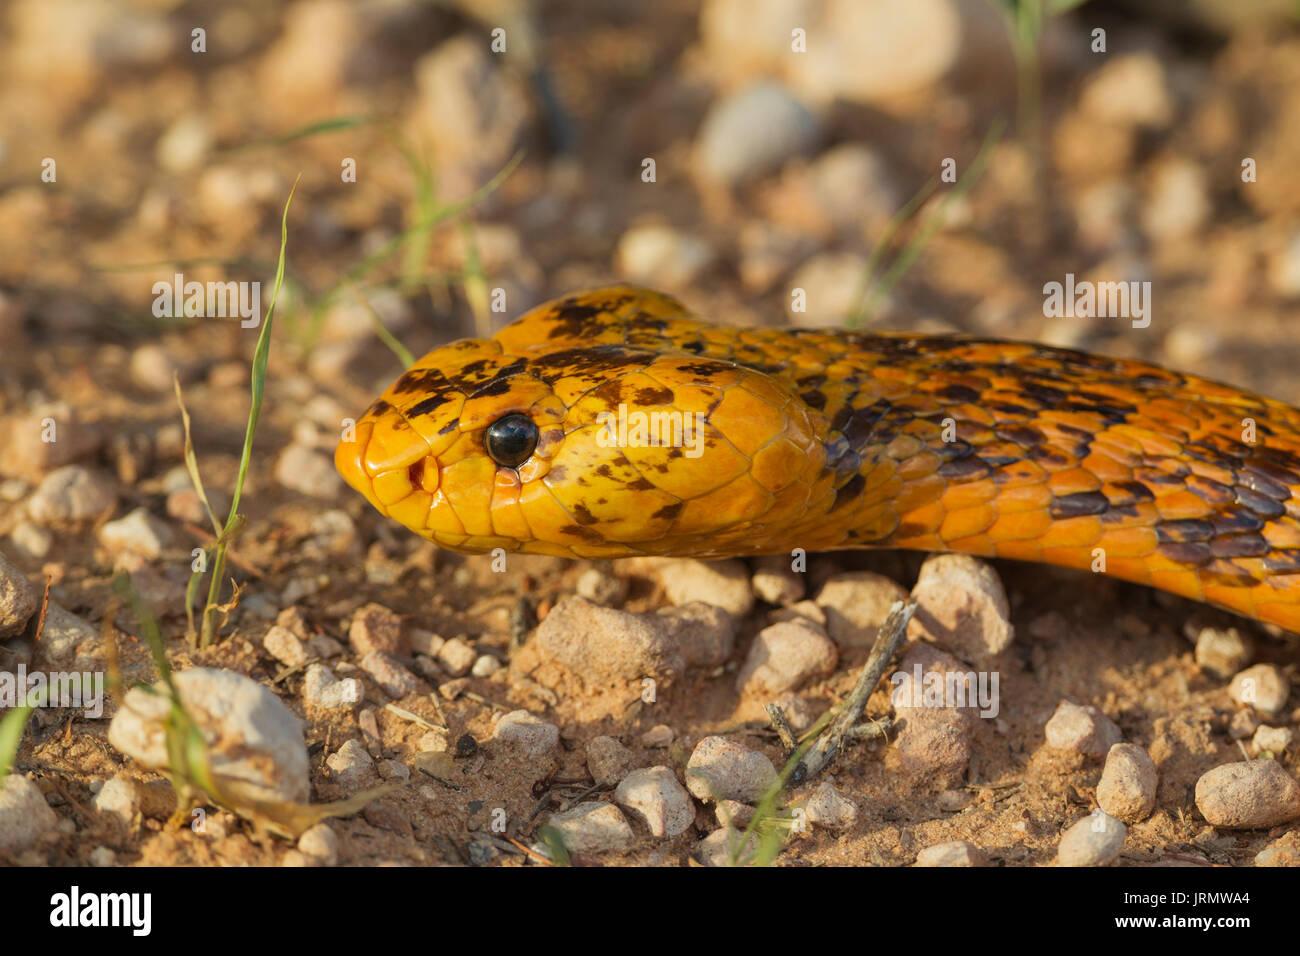 Cape Cobra (Naja nivea), Kalahari Desert, Kgalagadi Transfrontier Park, South Africa - Stock Image